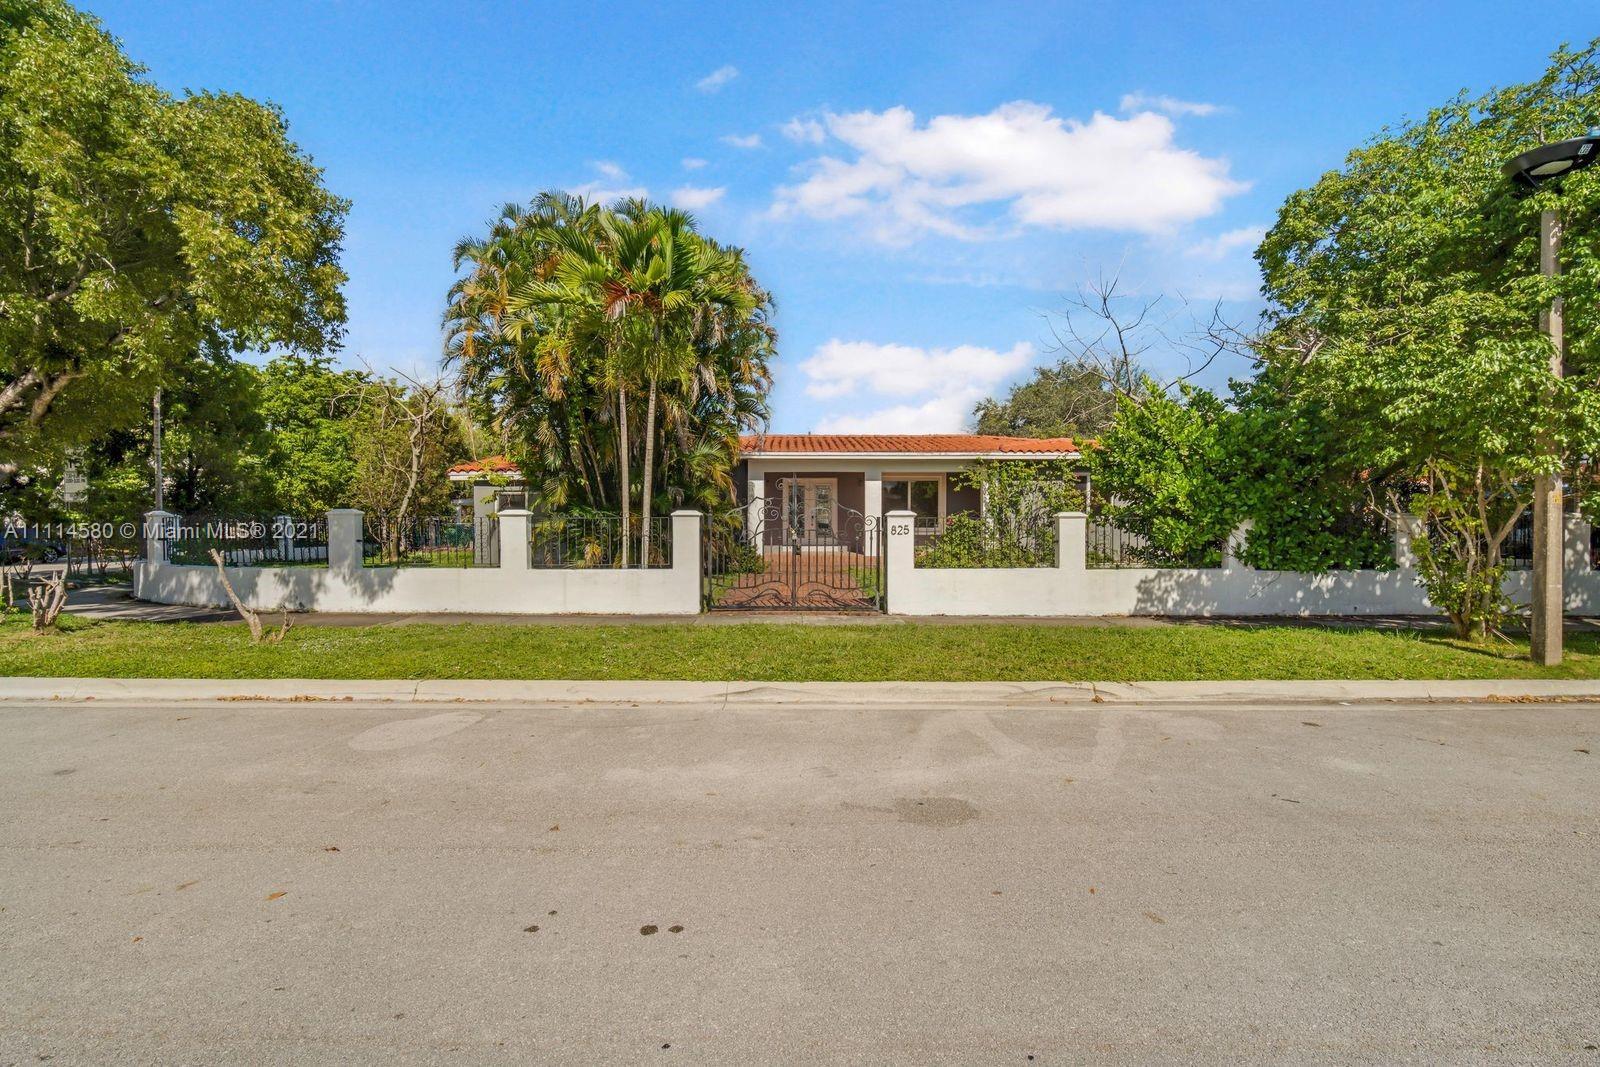 Single Family Home,For Sale,825 SW 28th Rd, Miami, Florida 33129,Brickell,realty,broker,condos near me